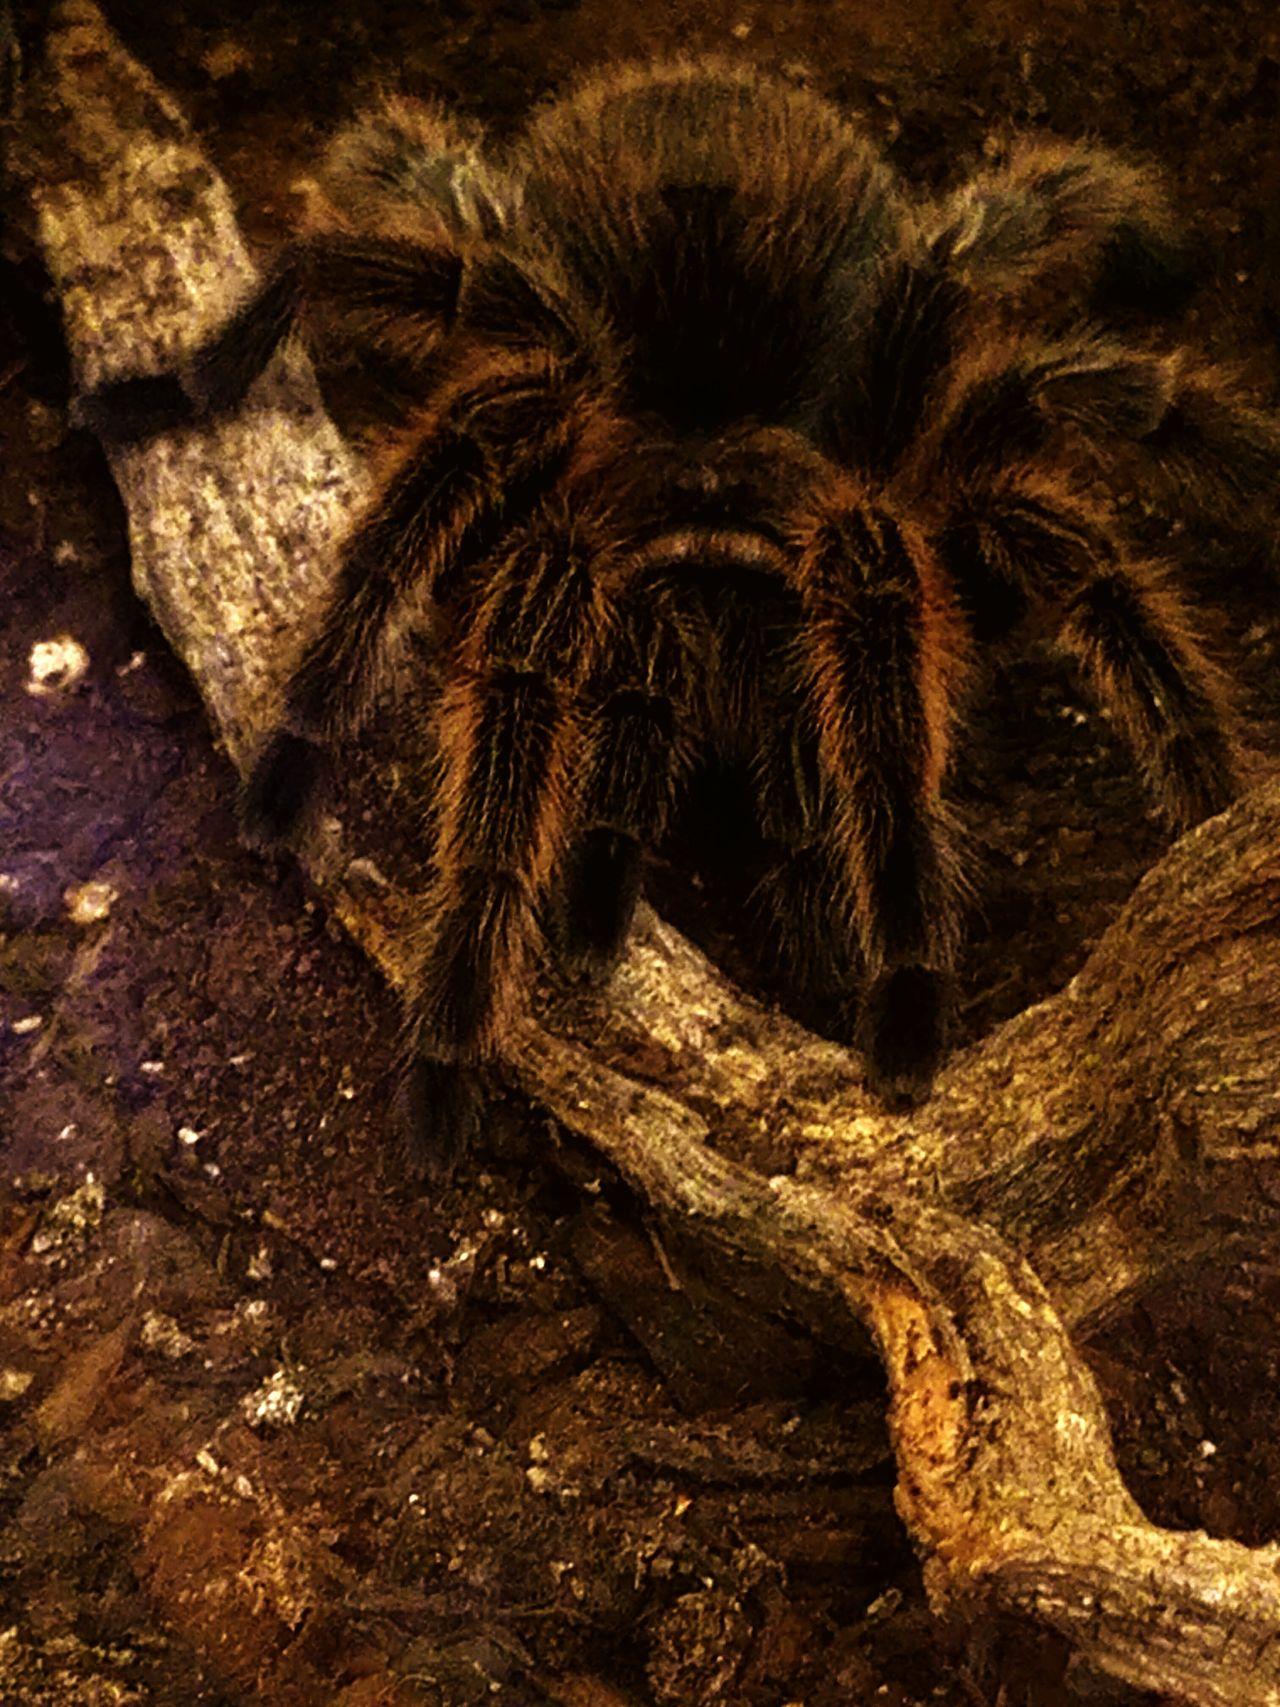 Turantula Spider Furry Spider Arachnid Arachnophobia